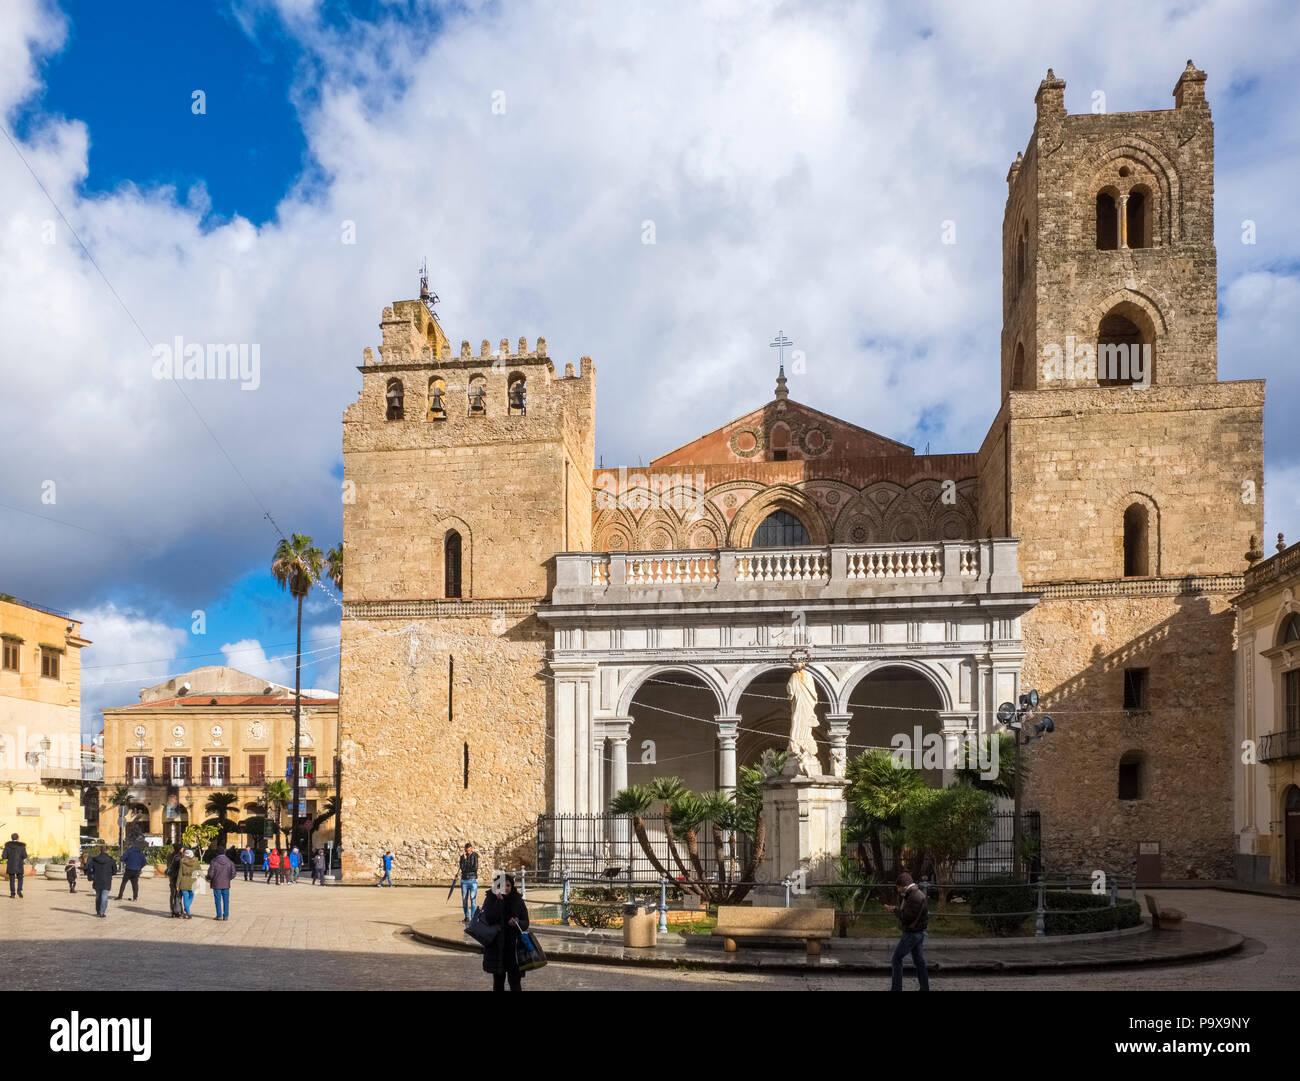 Normando catedral de Monreale, Sicilia, Italia, Europa Imagen De Stock